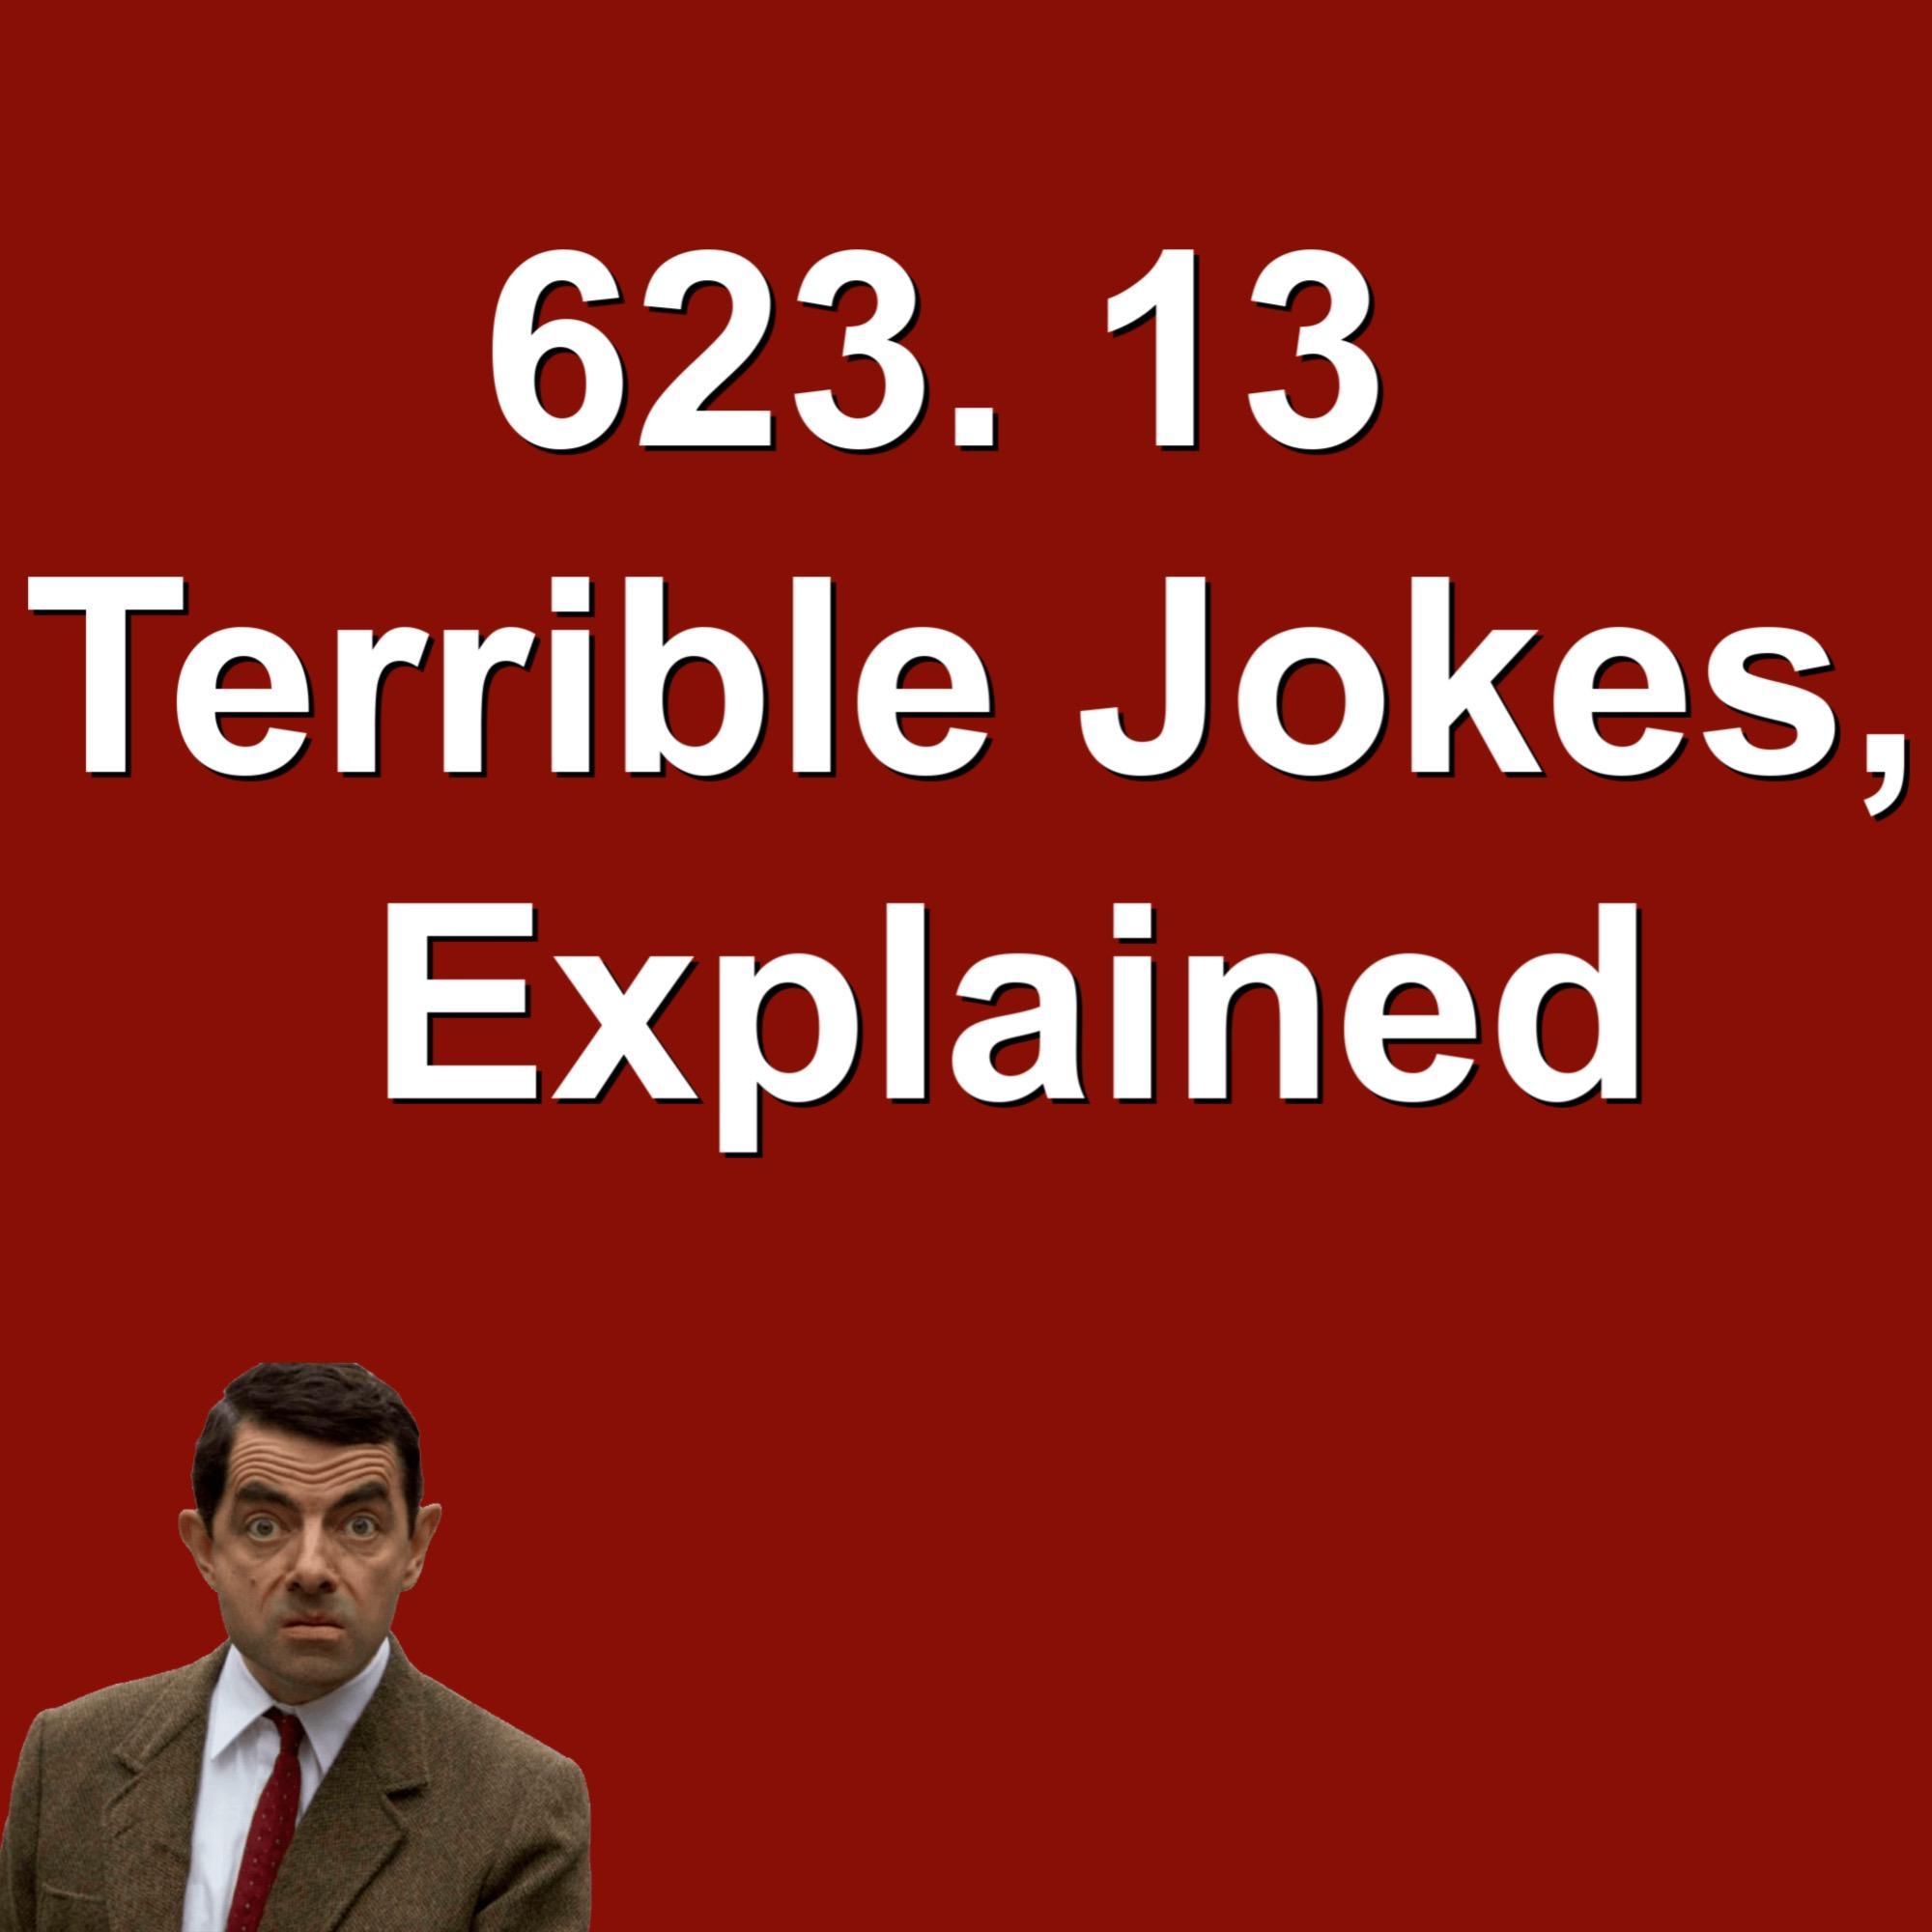 623. 13 Terrible Jokes, Explained